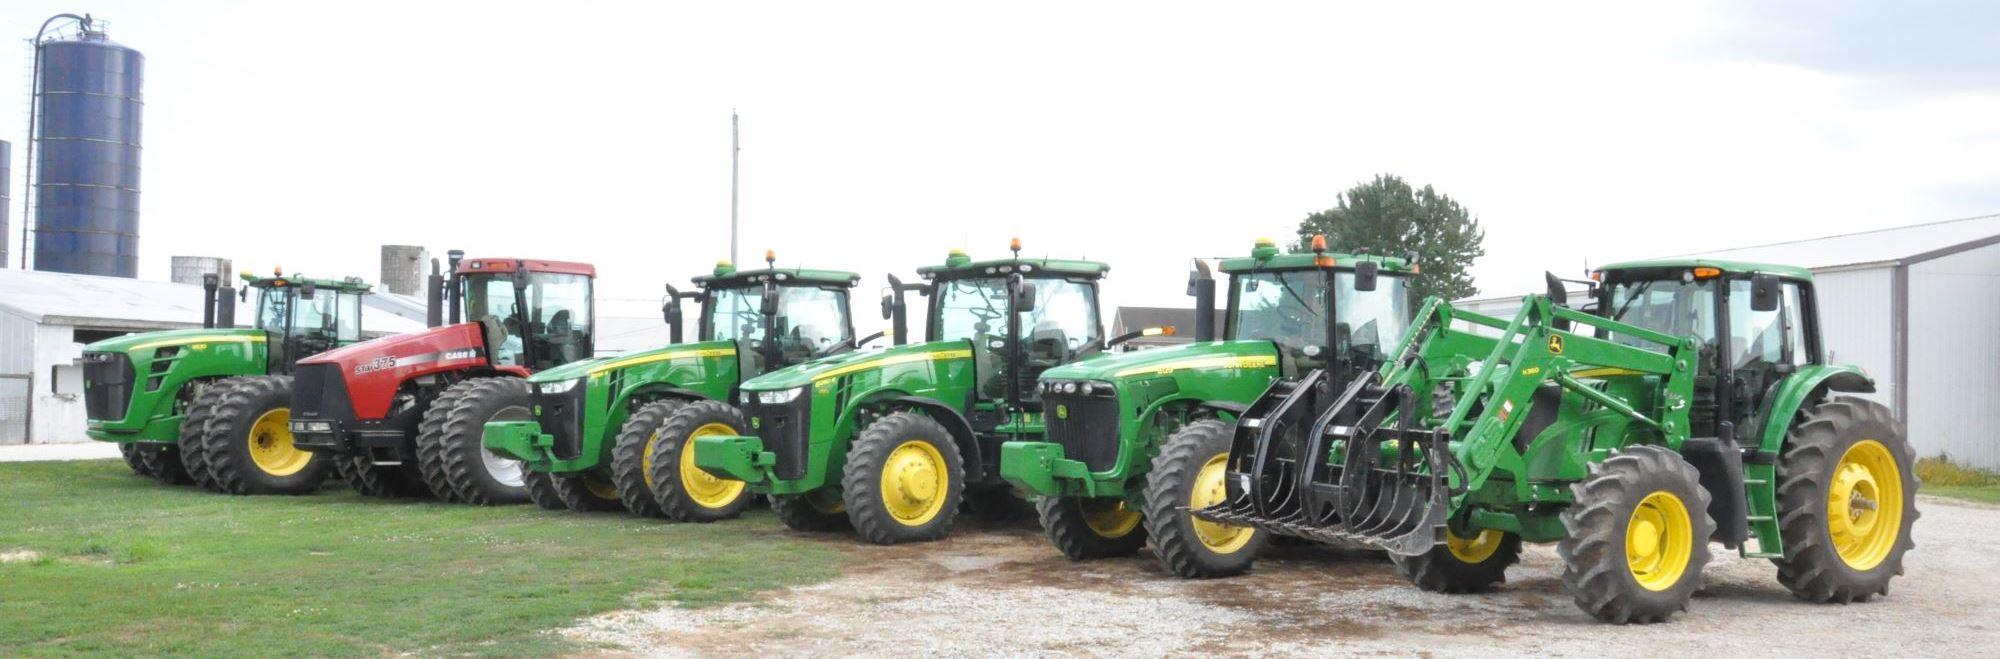 Green Tractor In The Field Bottle Opener Fridge Magnet